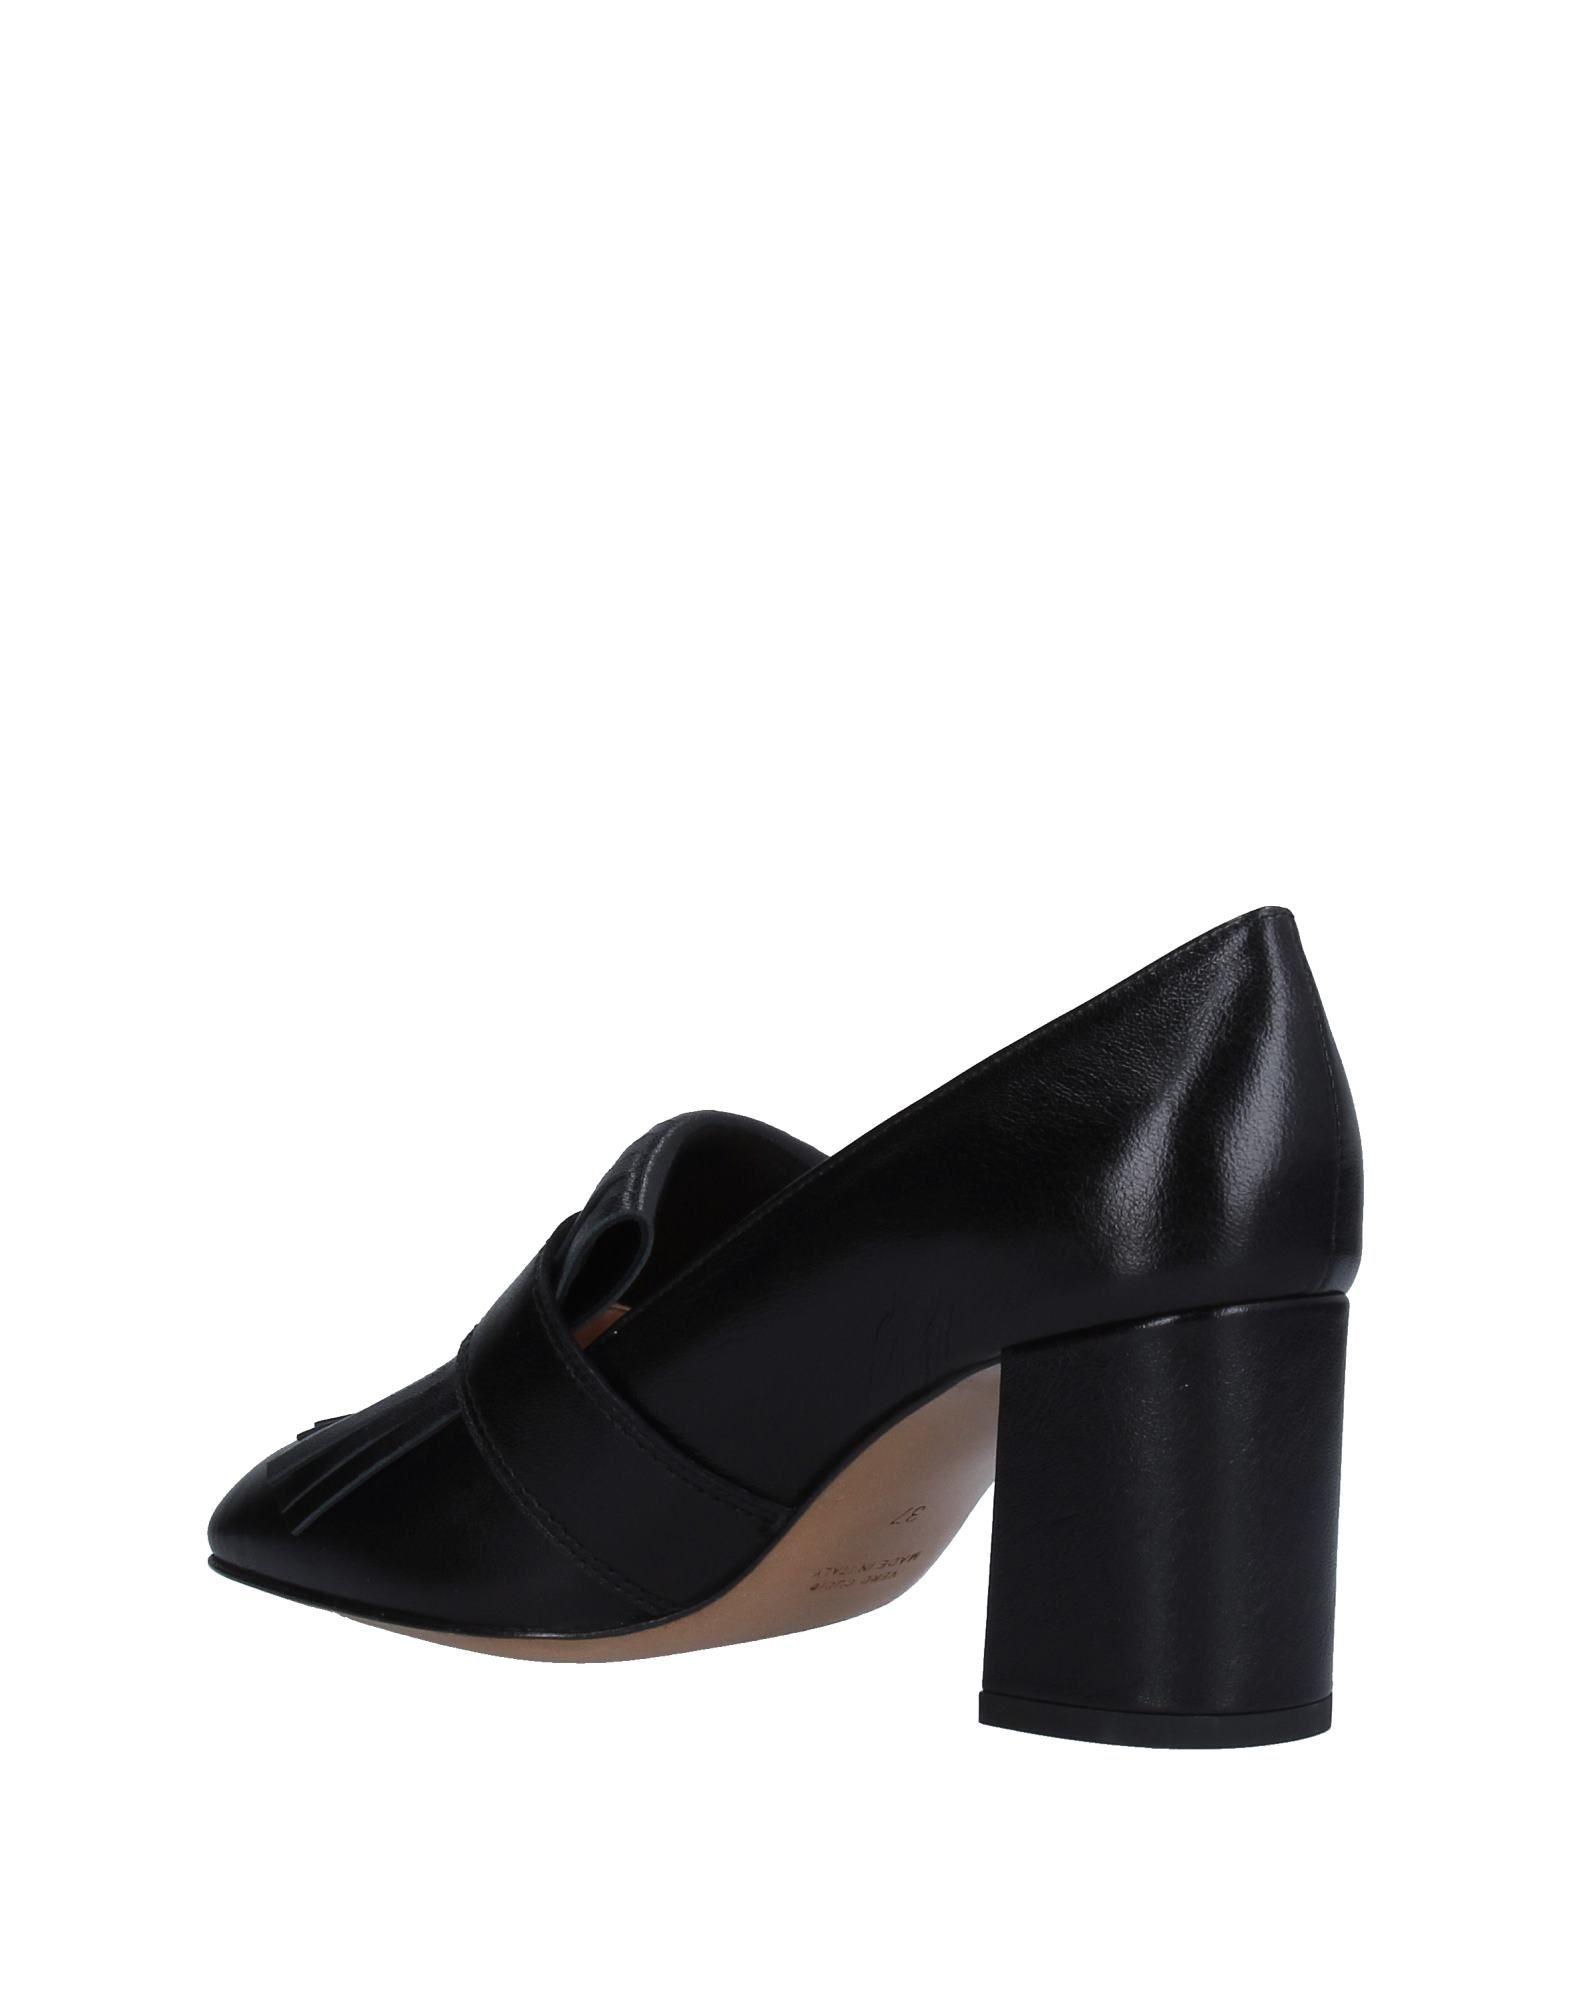 La Corte Della Pelle By Franco Ballin Mokassins Damen  11224598OK Gute Qualität beliebte Schuhe